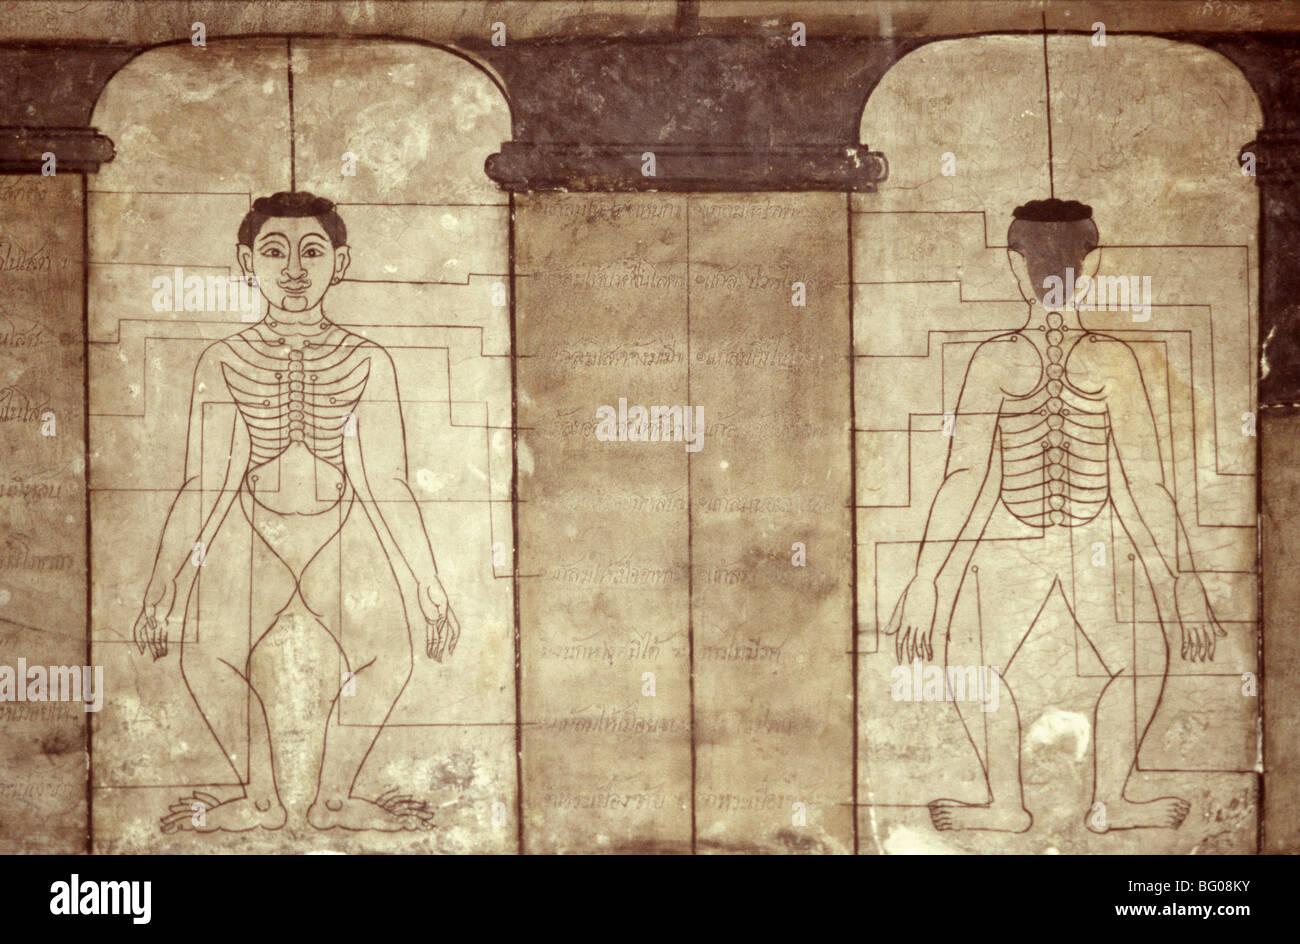 hight resolution of diagram of thai massage points wat po bangkok thailand southeast asia asia